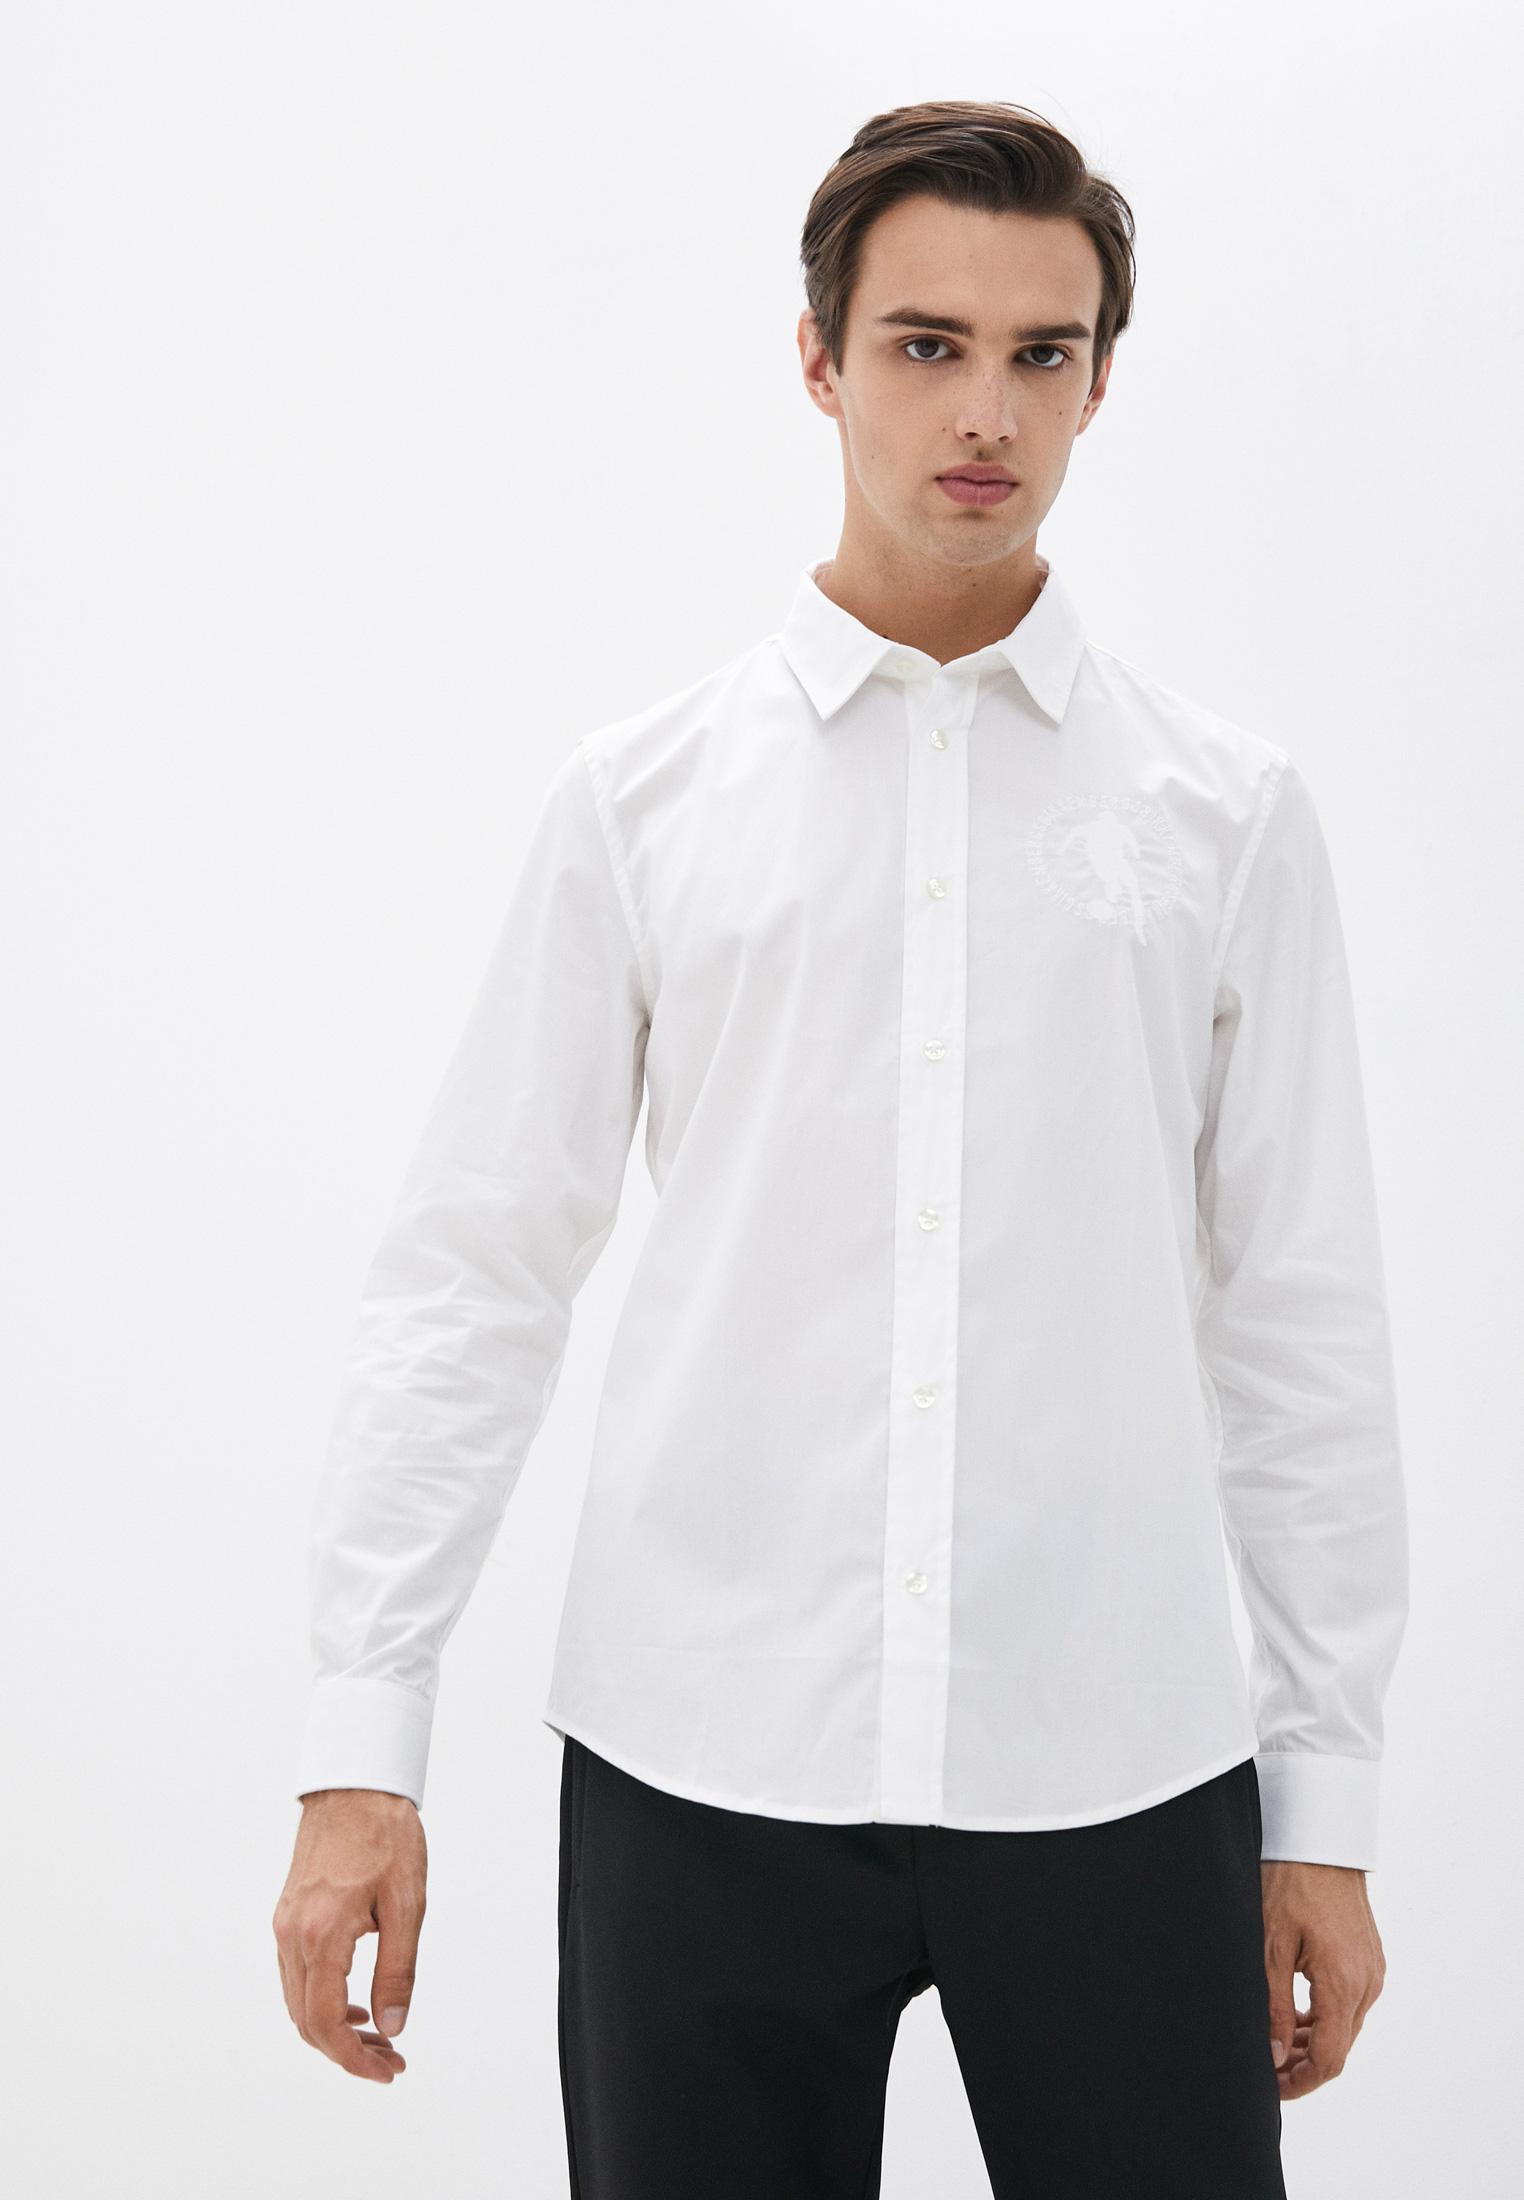 Рубашка с длинным рукавом Bikkembergs (Биккембергс) C C 009 2C S 2931: изображение 6